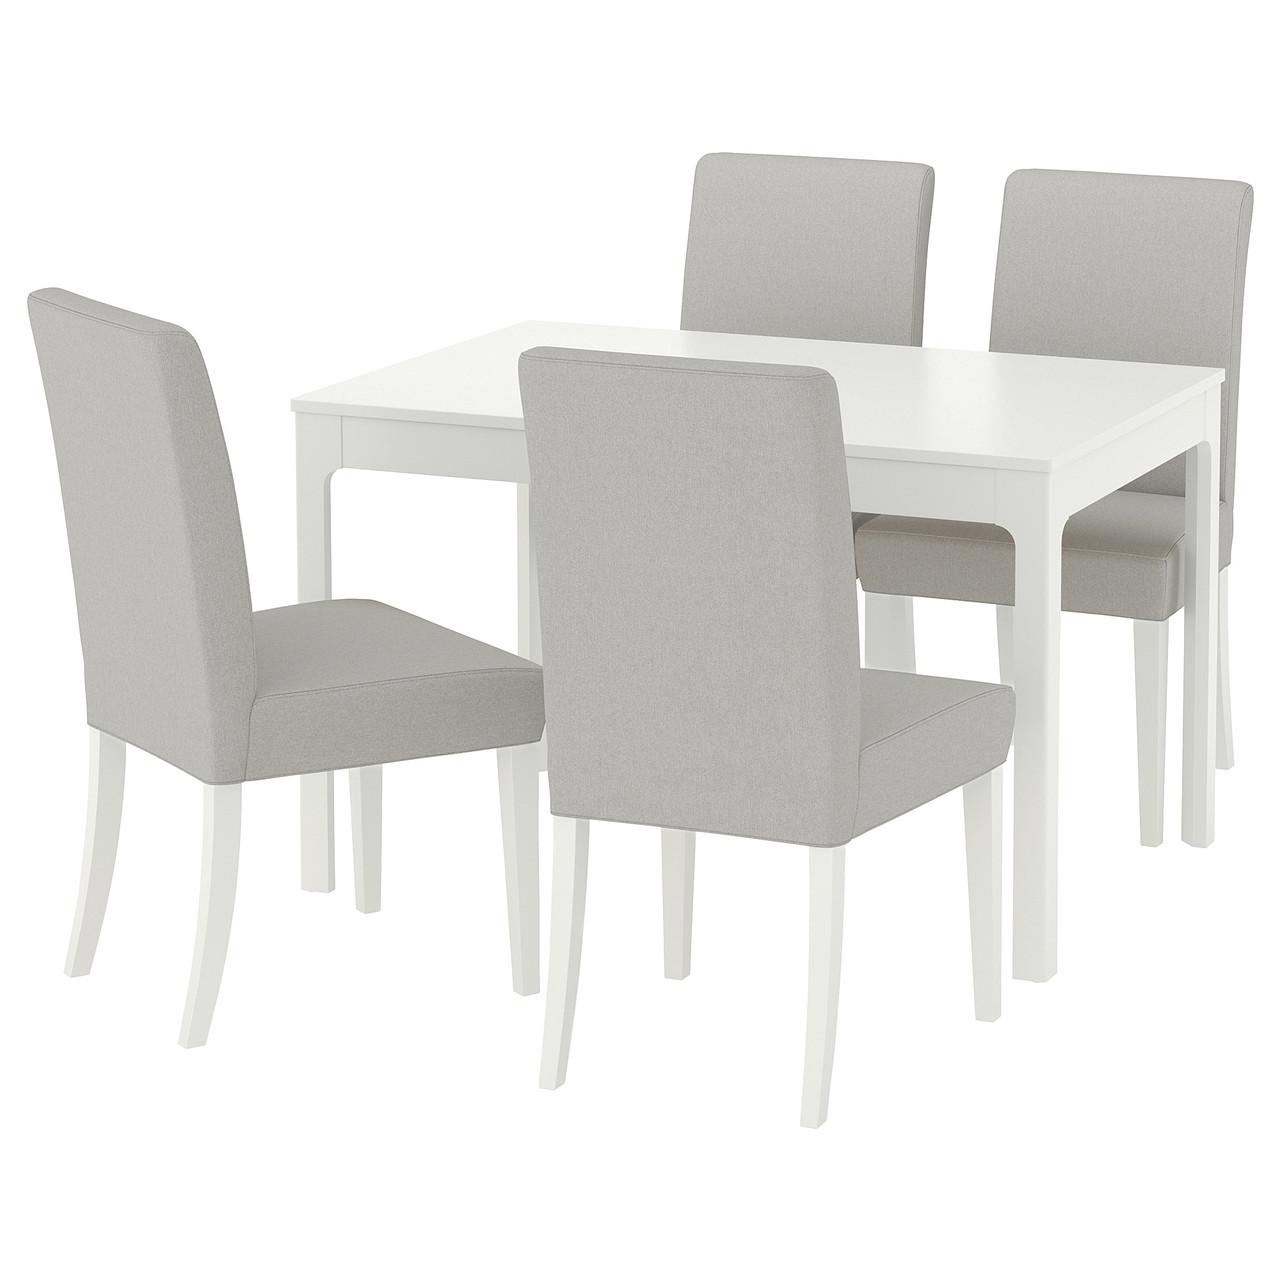 IKEA EKEDALEN / HENRIKSDAL (692.213.39) Стол и 4 стула, Orrsta светло-серый